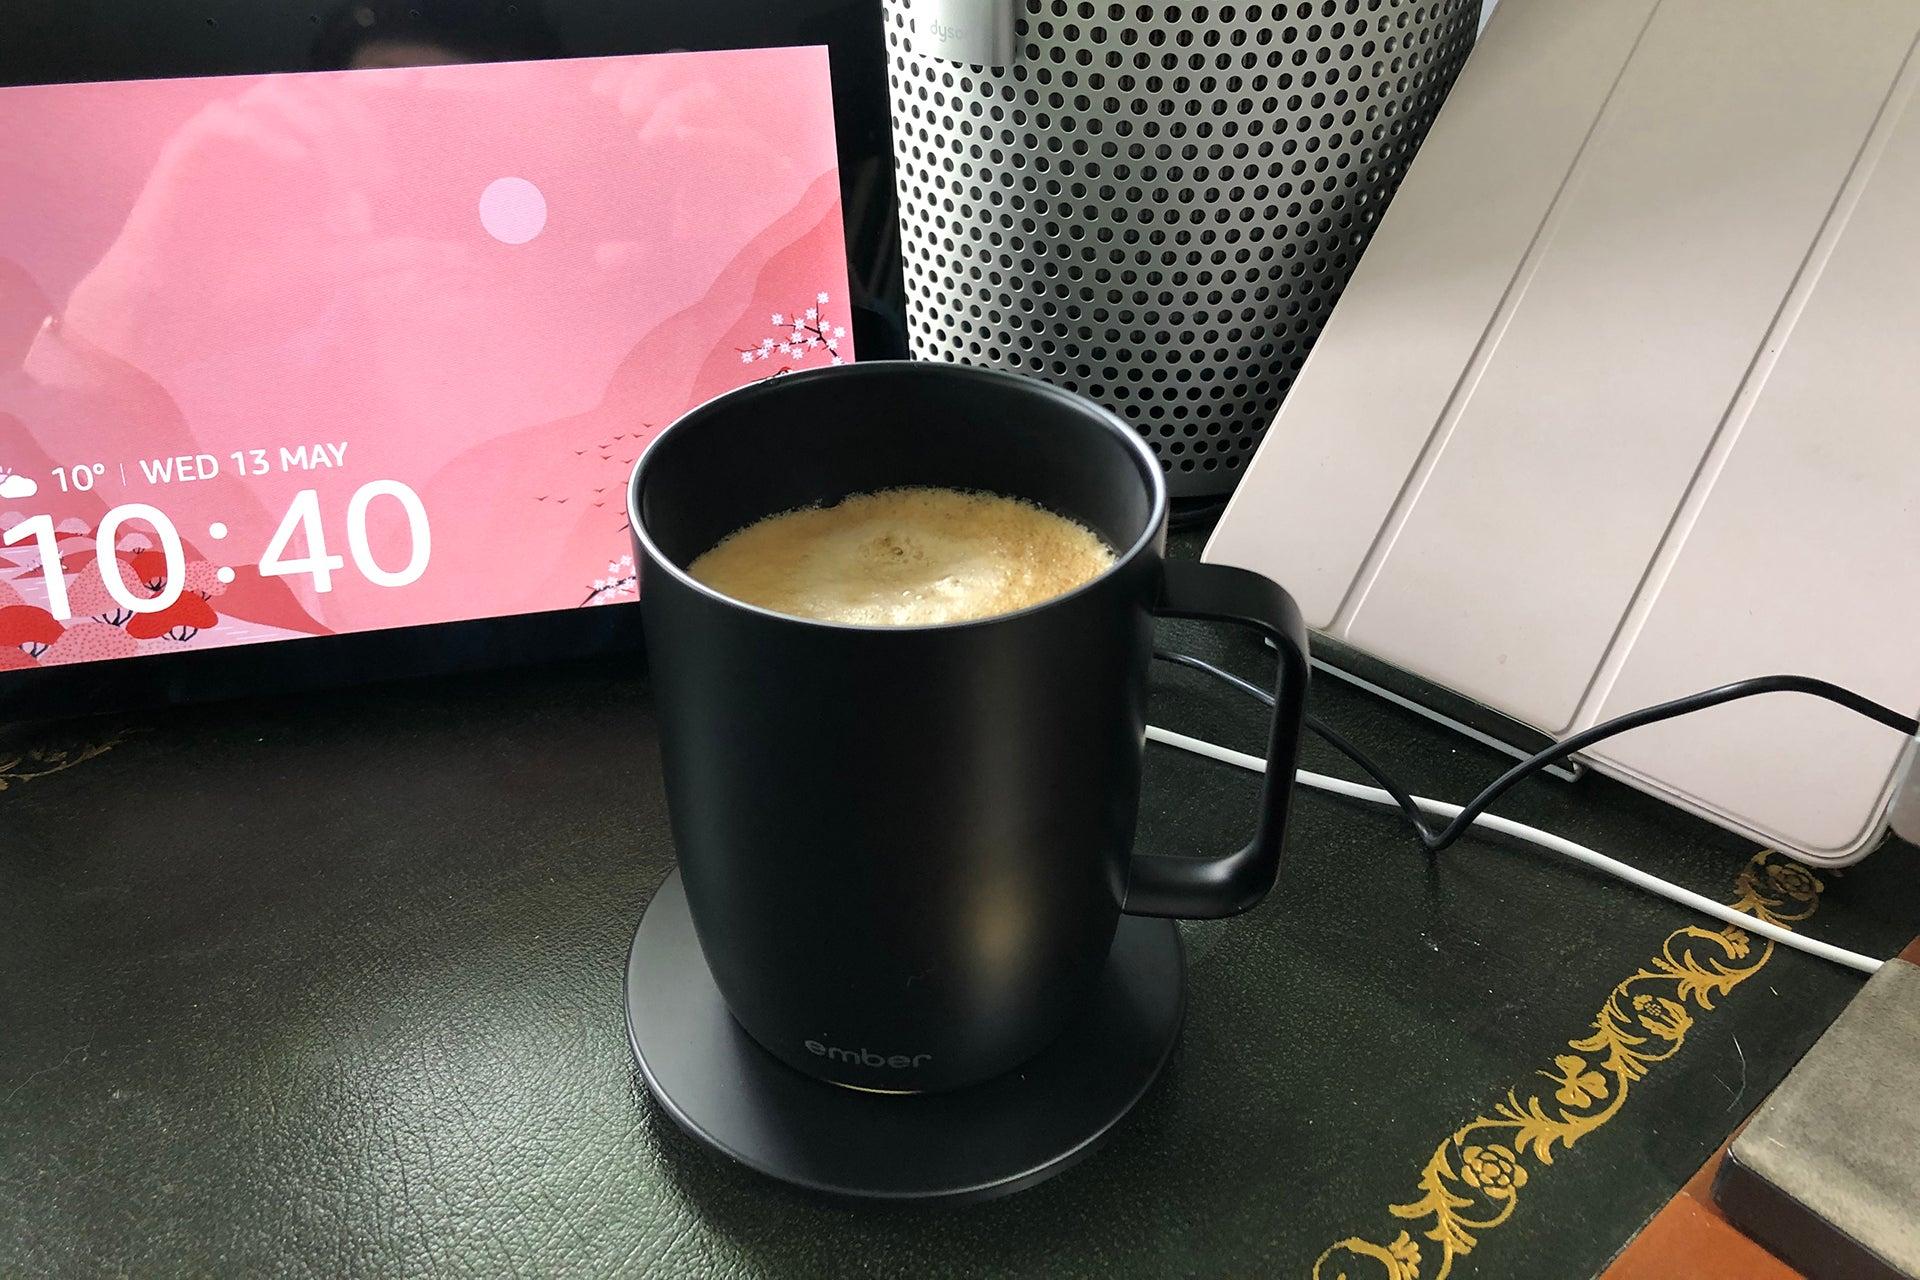 Ember Mug 2 Review | Trusted Reviews